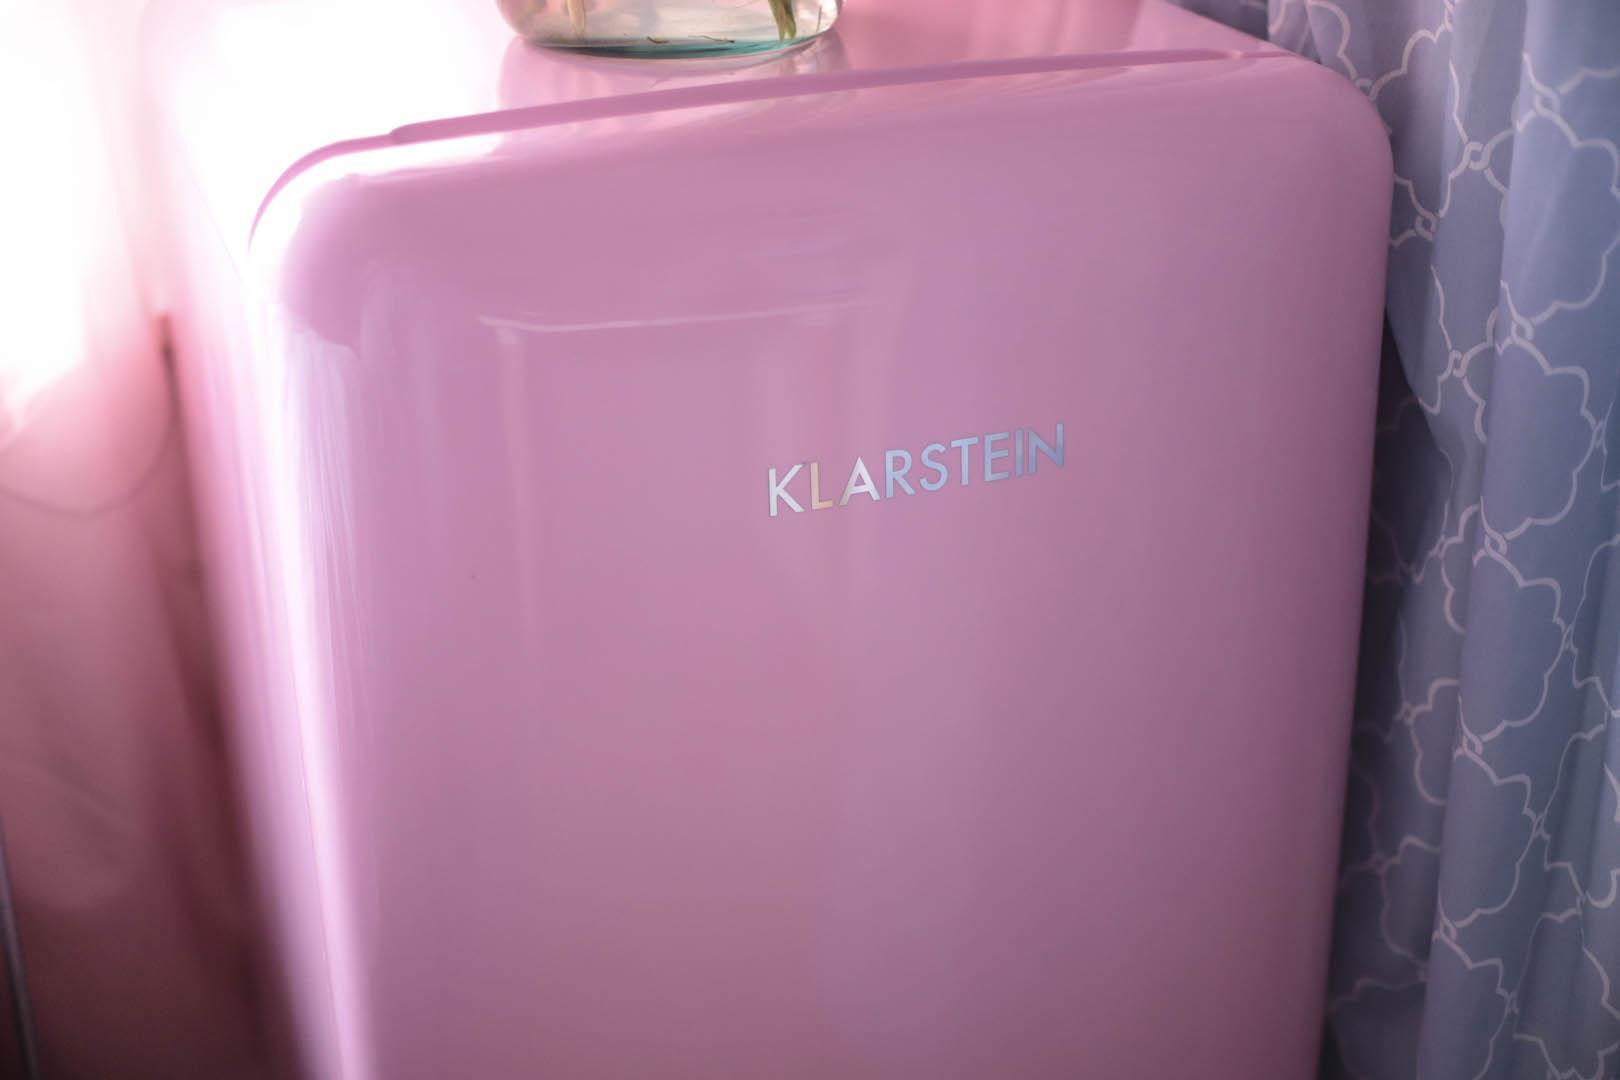 Kühlschrank Rosa : Retro kühlschrank pink gorenje retro collection gorenje